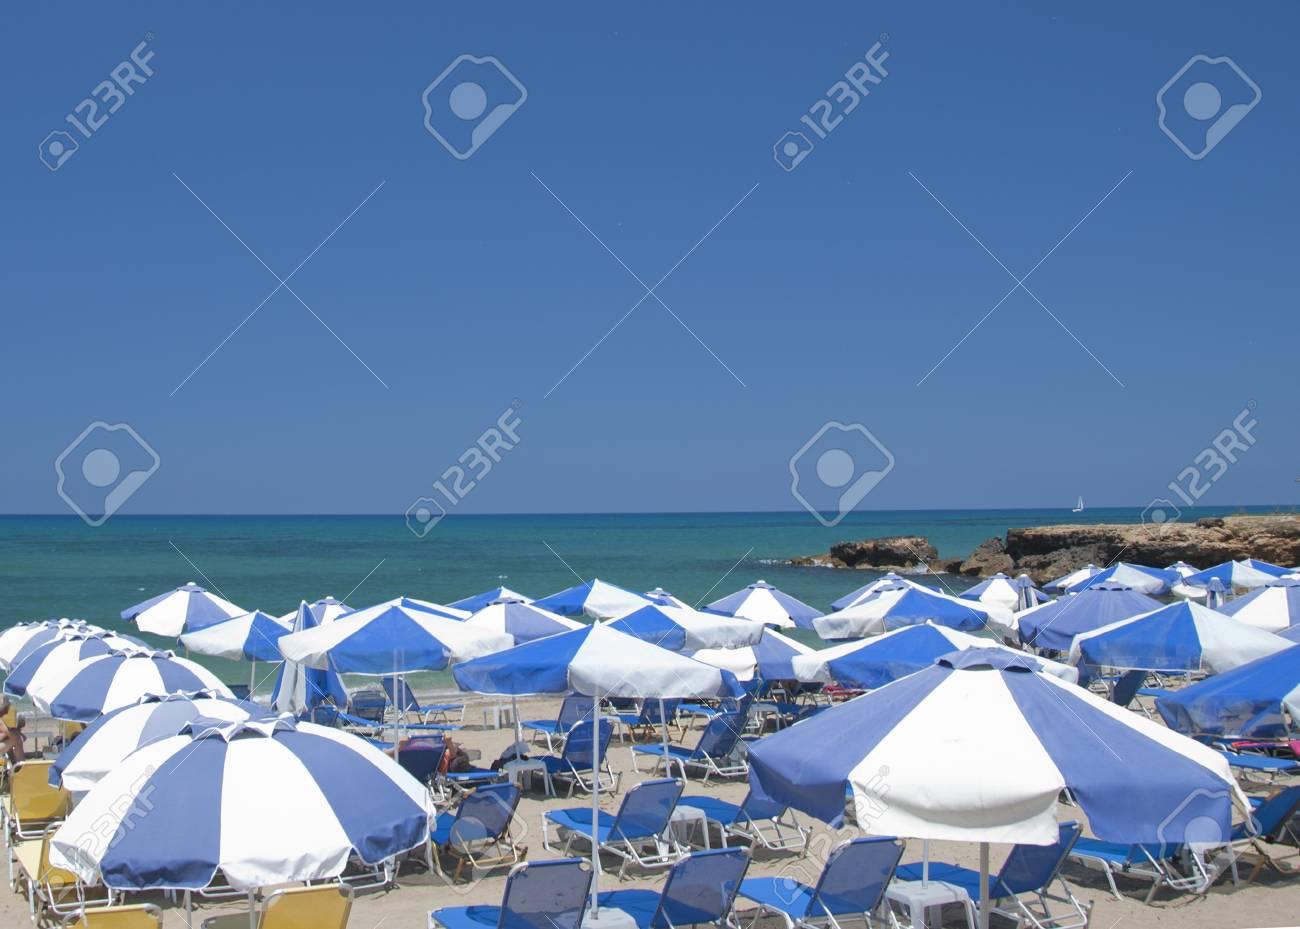 Blue and White Beach Umbrellas on a Beach in Greece under a blue summer sky Stock Photo - 9762104